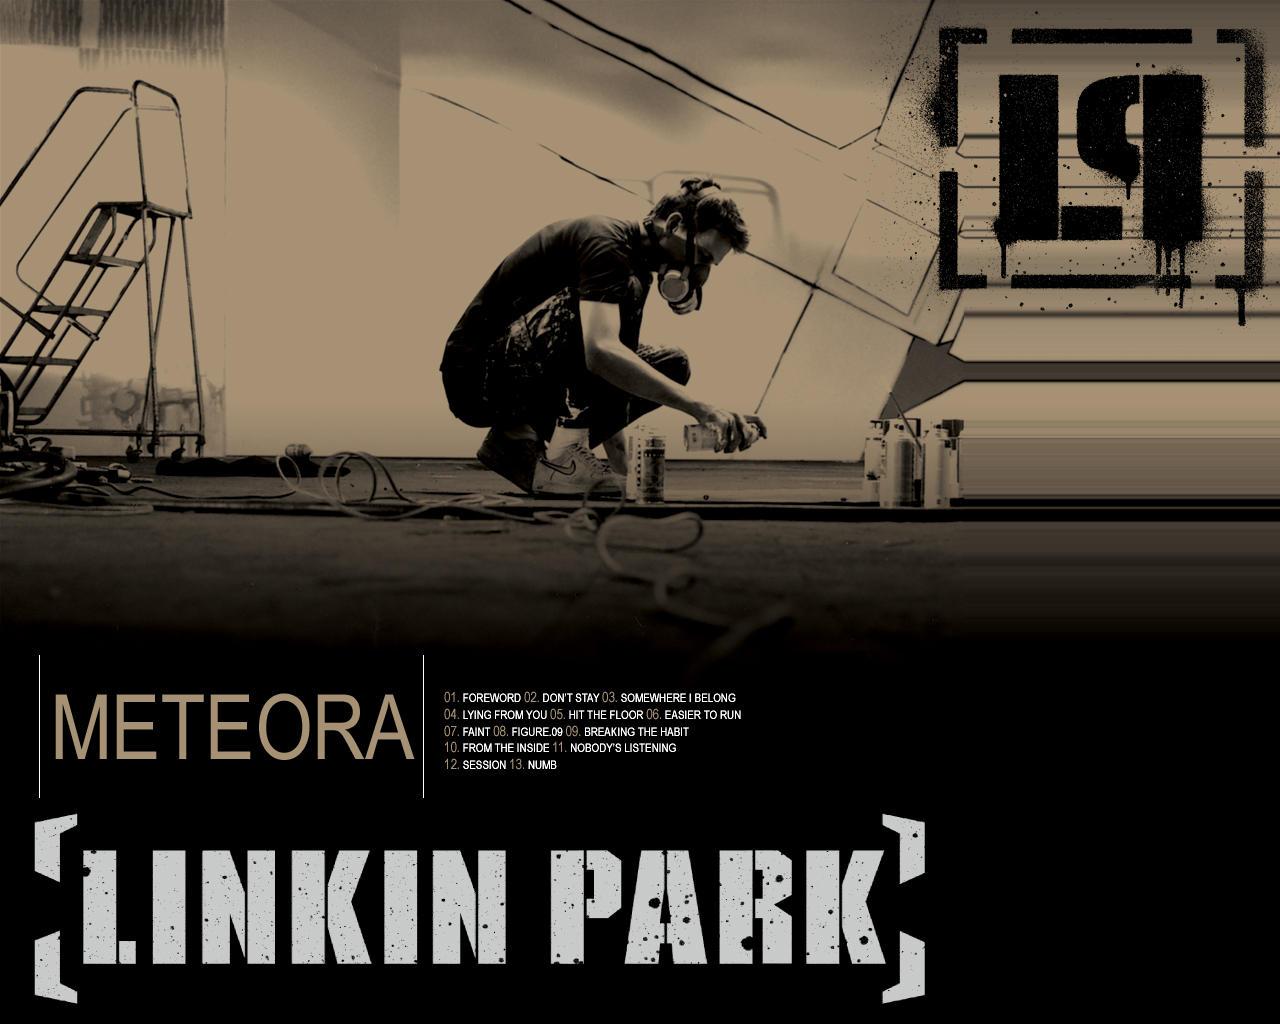 Link park meteora download adobe